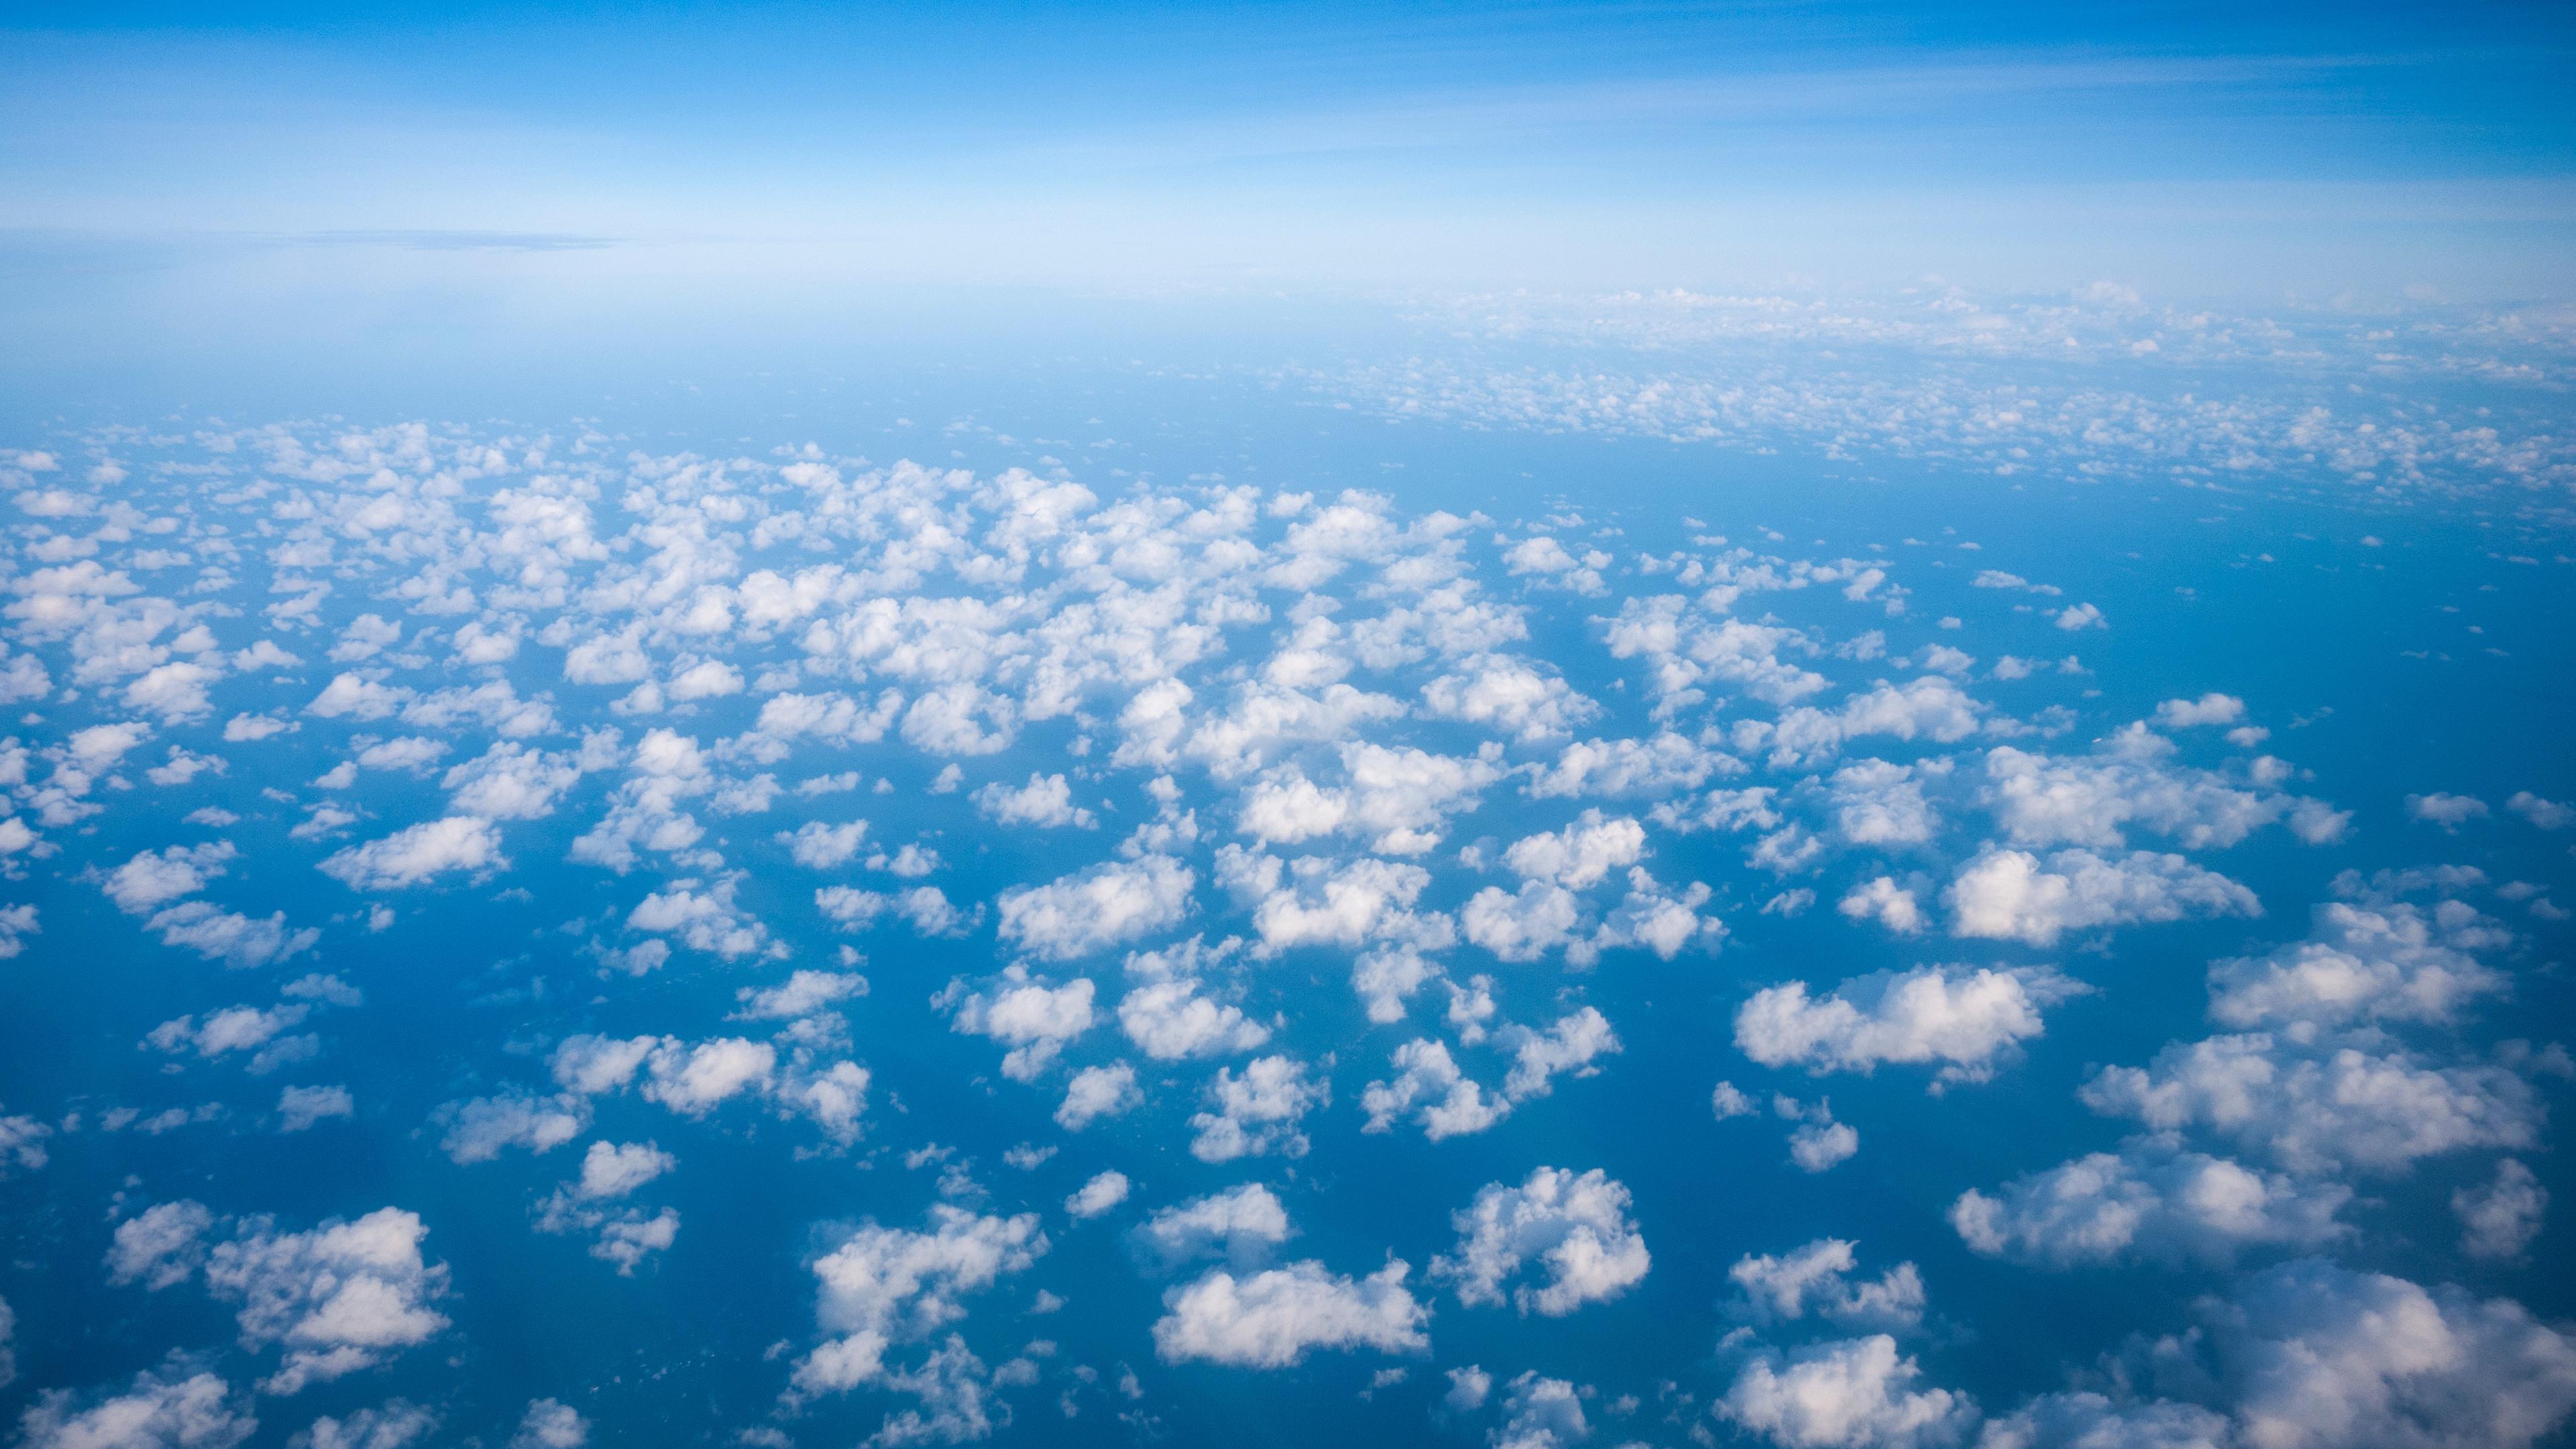 clouds view from plane 4k 1540136429 - Clouds View From Plane 4k - plane wallpapers, nature wallpapers, hd-wallpapers, clouds wallpapers, 5k wallpapers, 4k-wallpapers